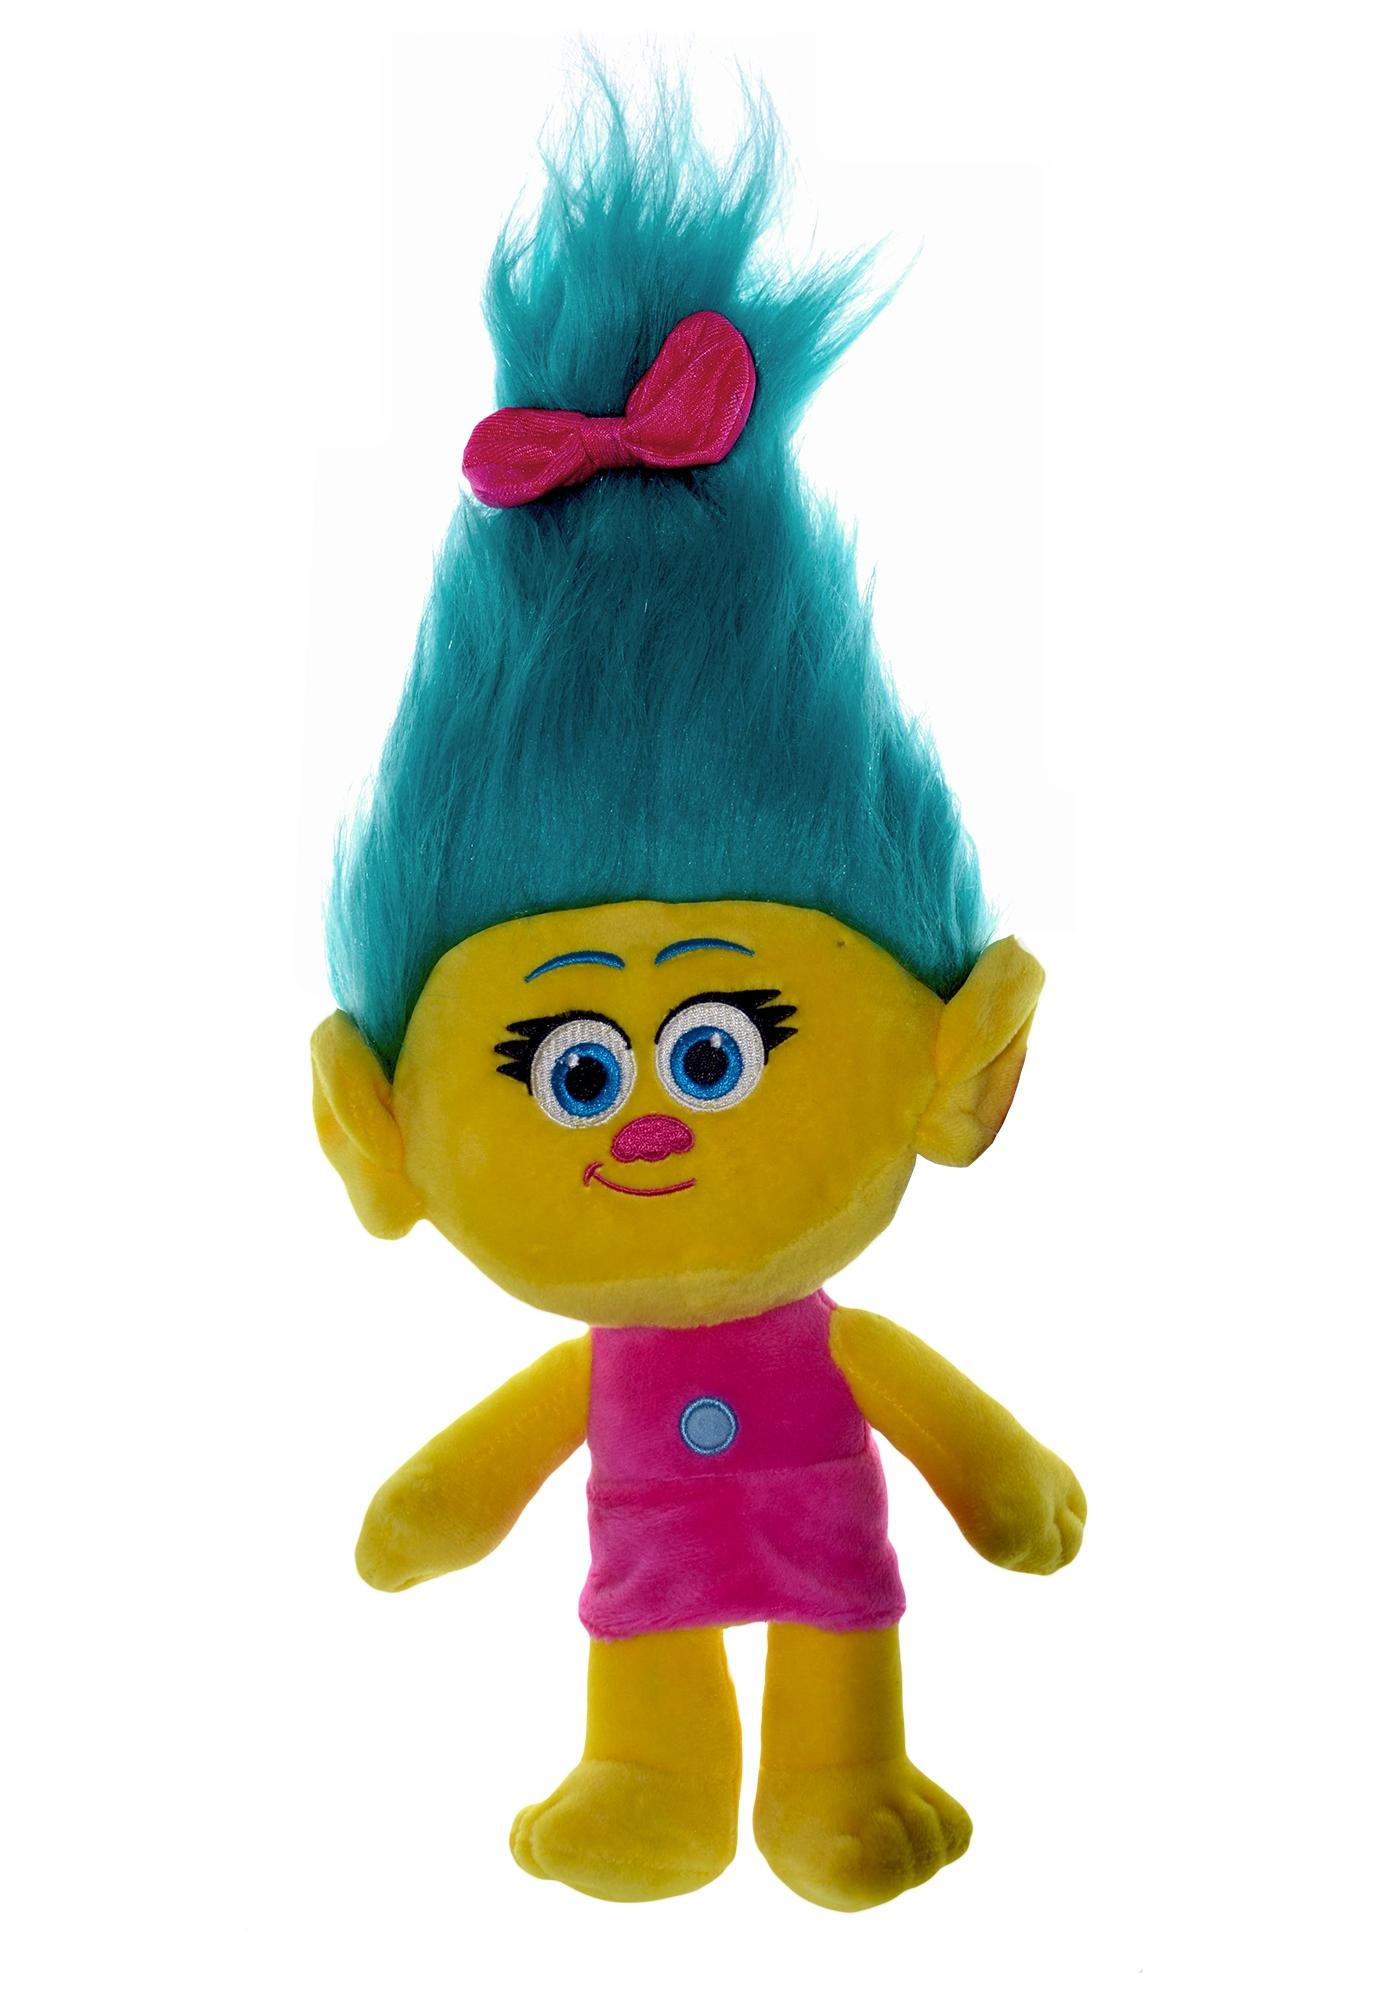 Trolls Smidge 12 Inch Plush Soft Toy 8438520426475